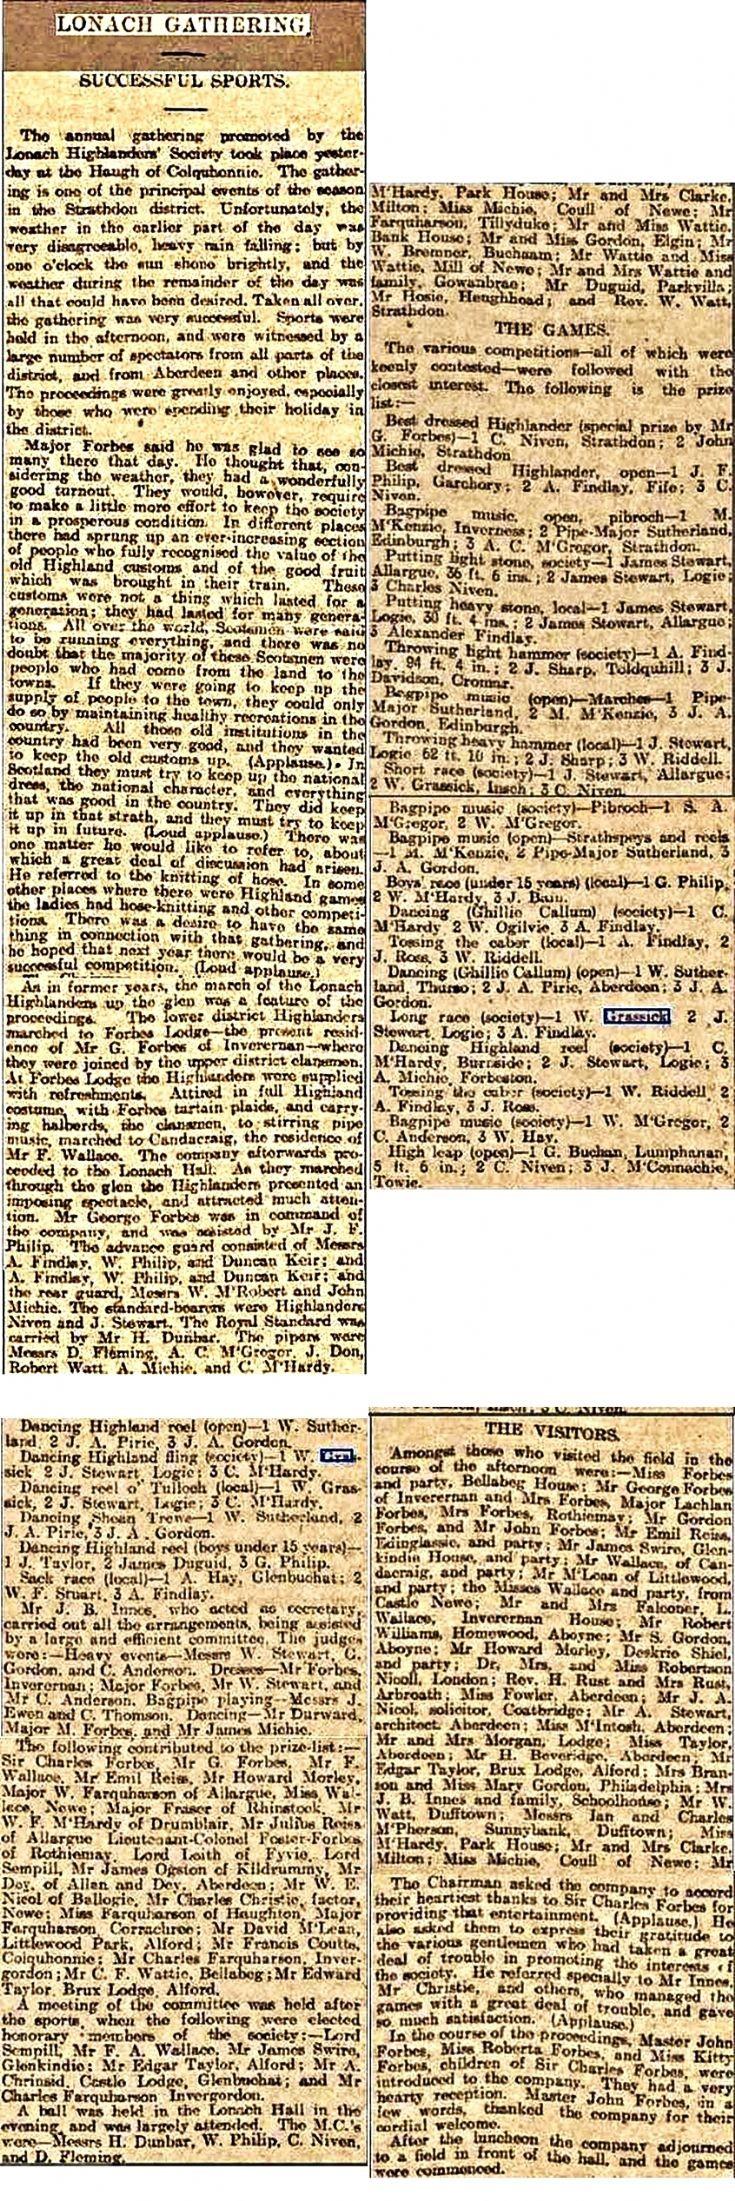 192 1907 Lonach Gathering